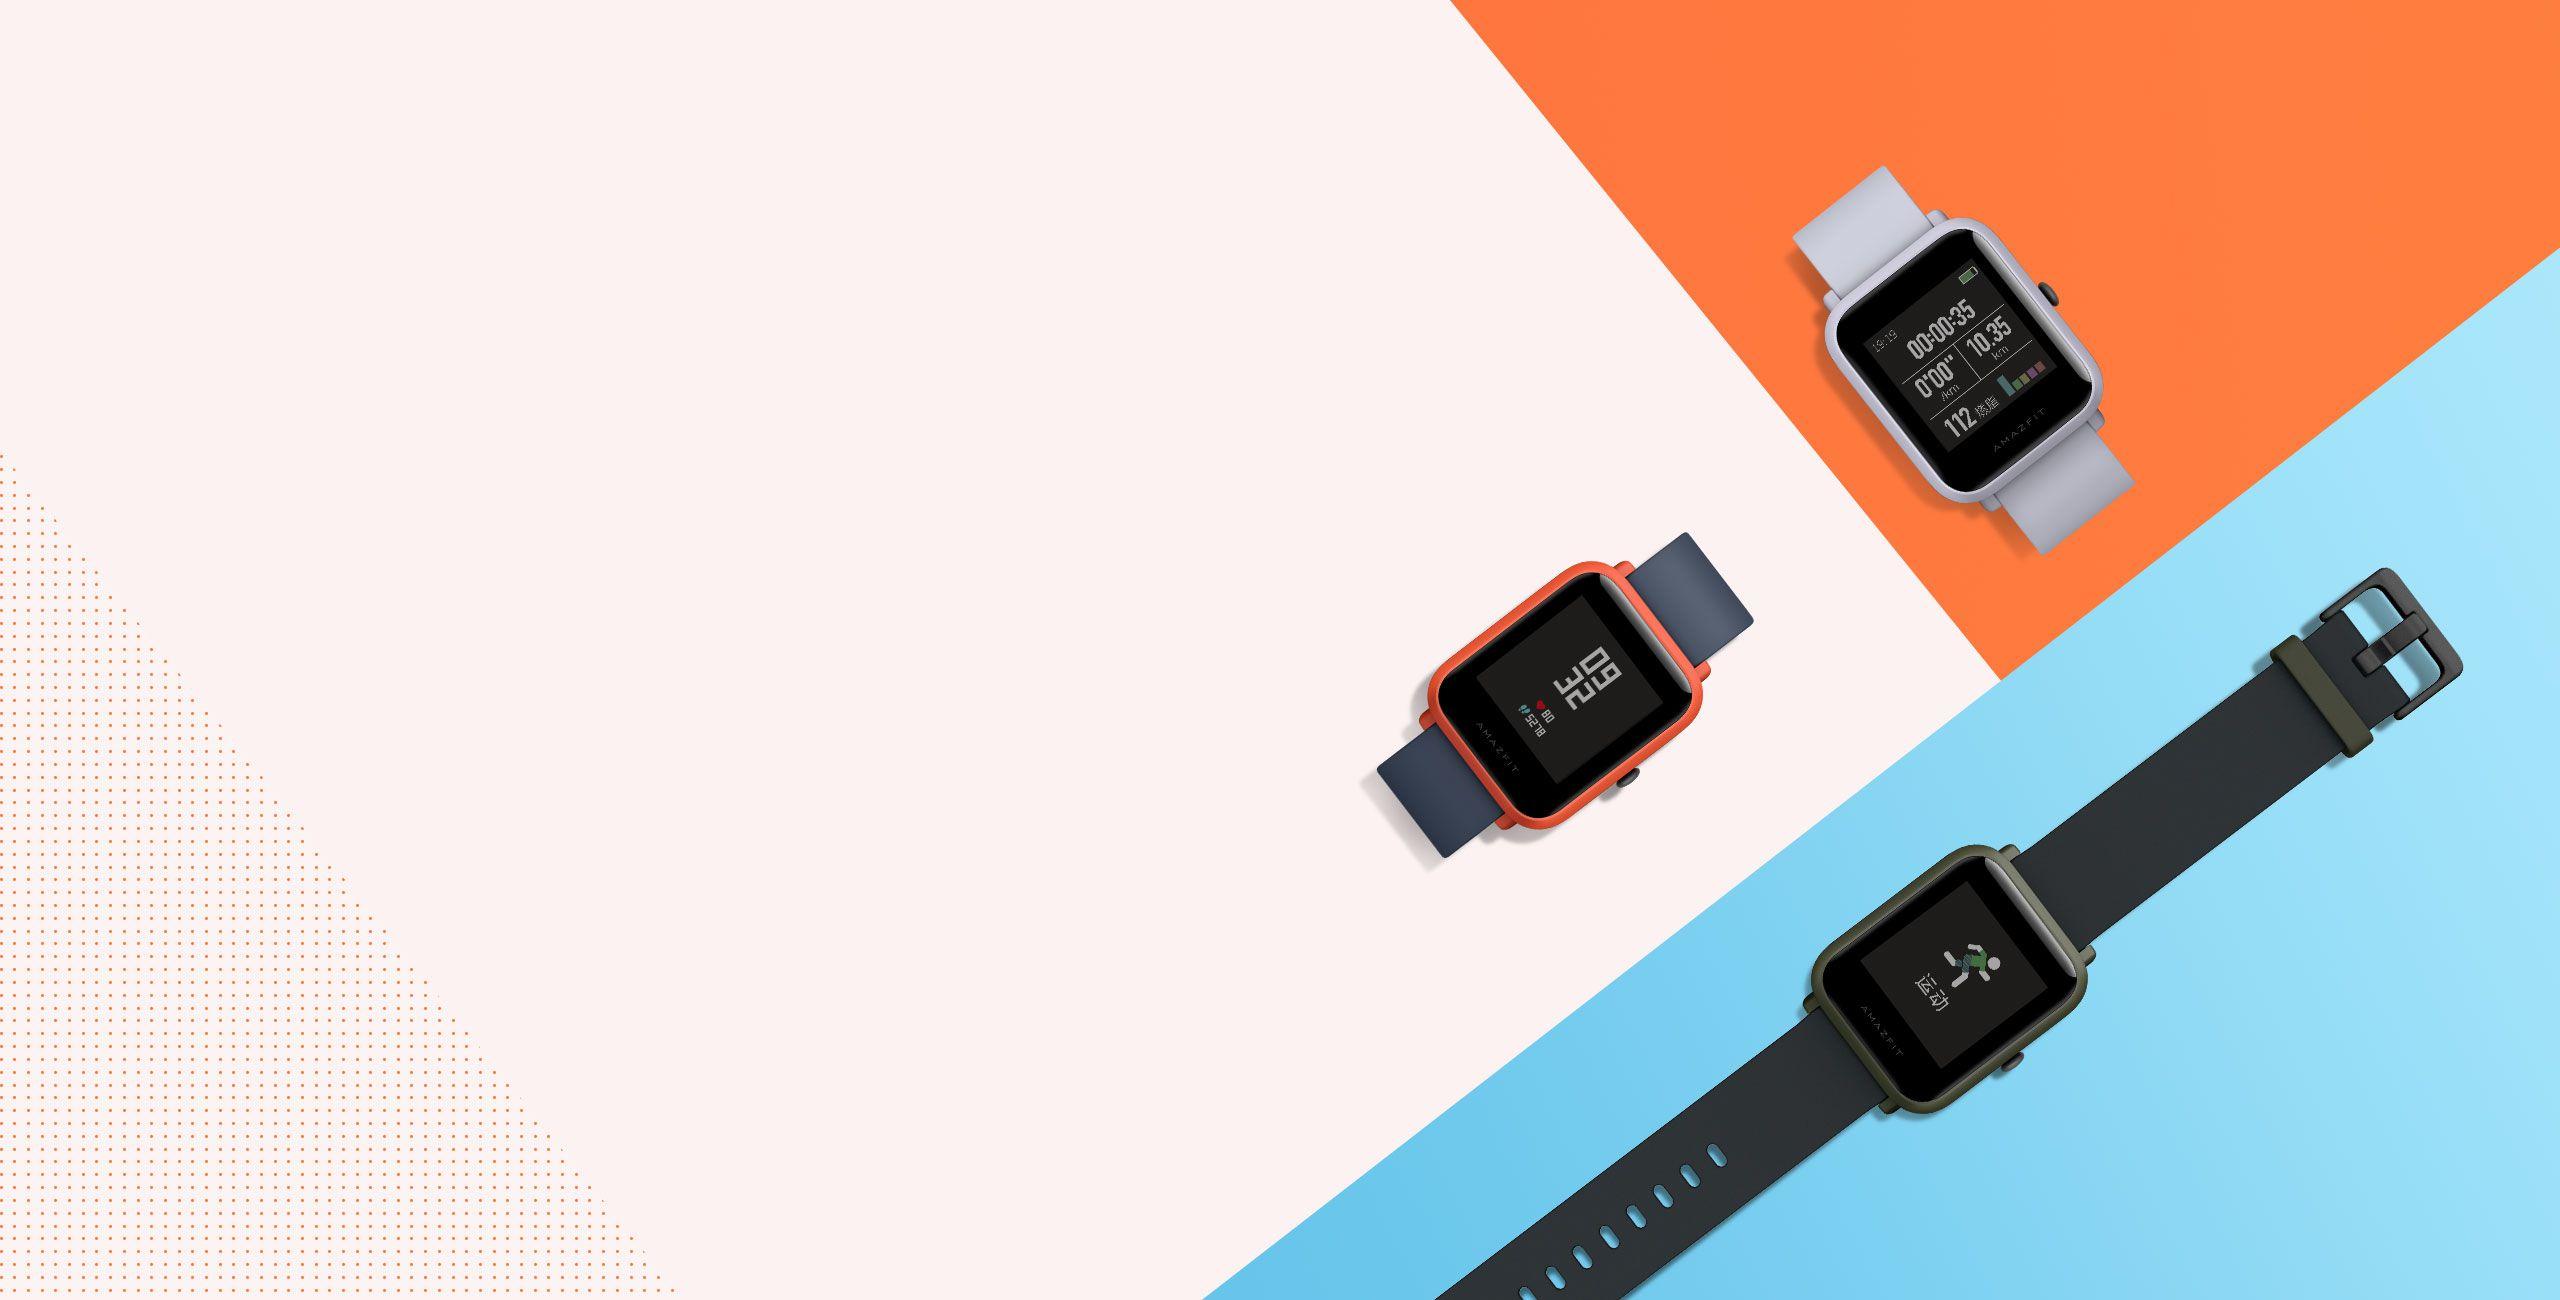 米动手表青春版 小米商城 Fitbit Surge Wearable Fitbit